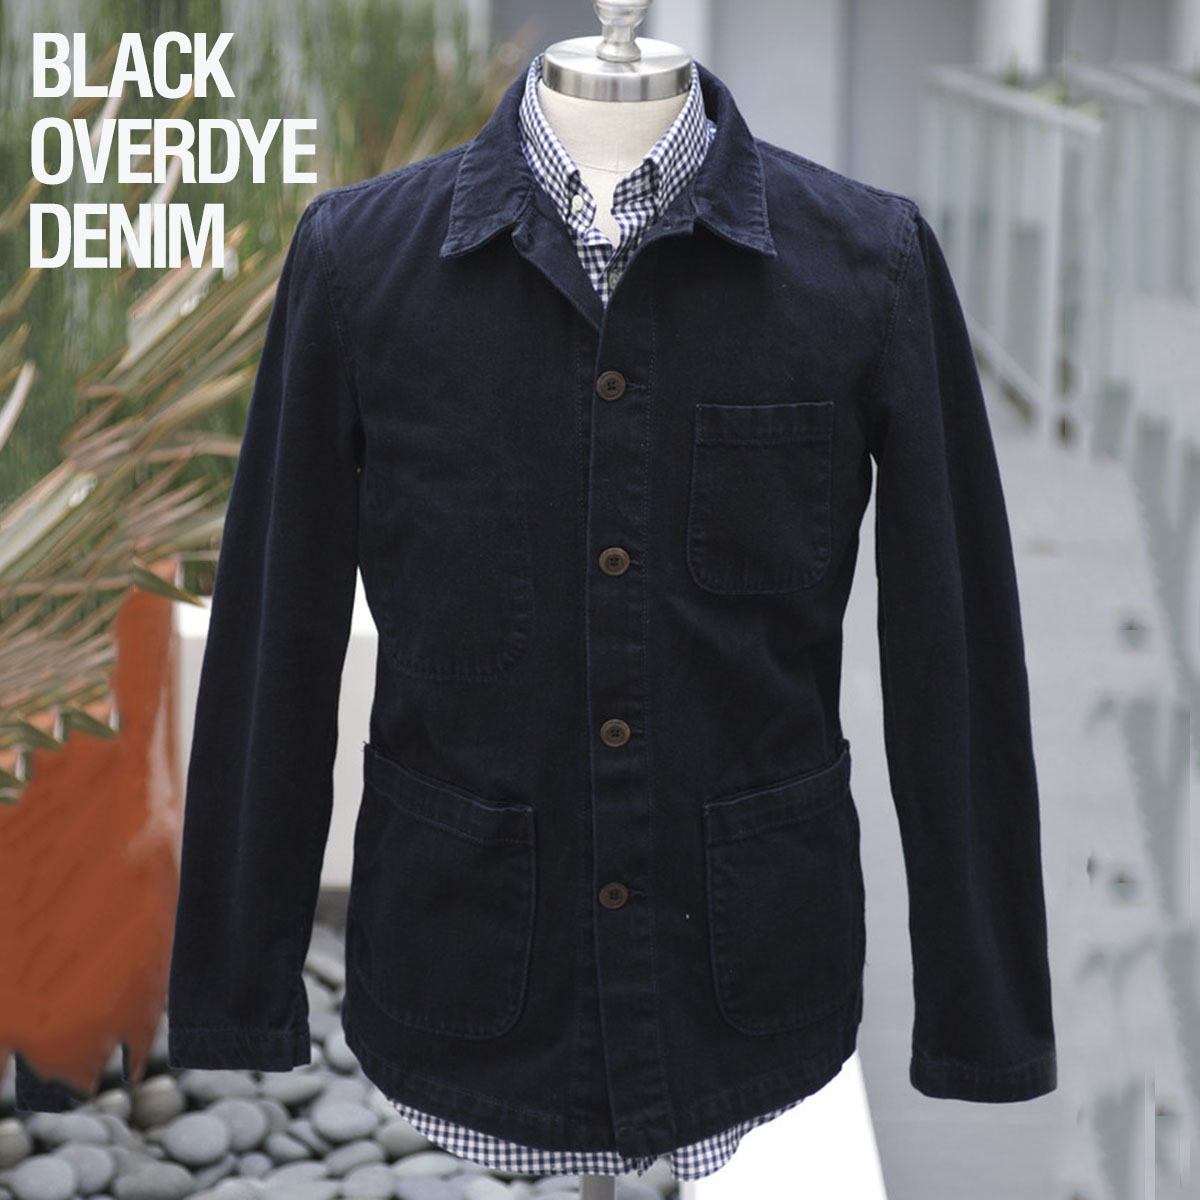 Black Overdye Denim.jpg